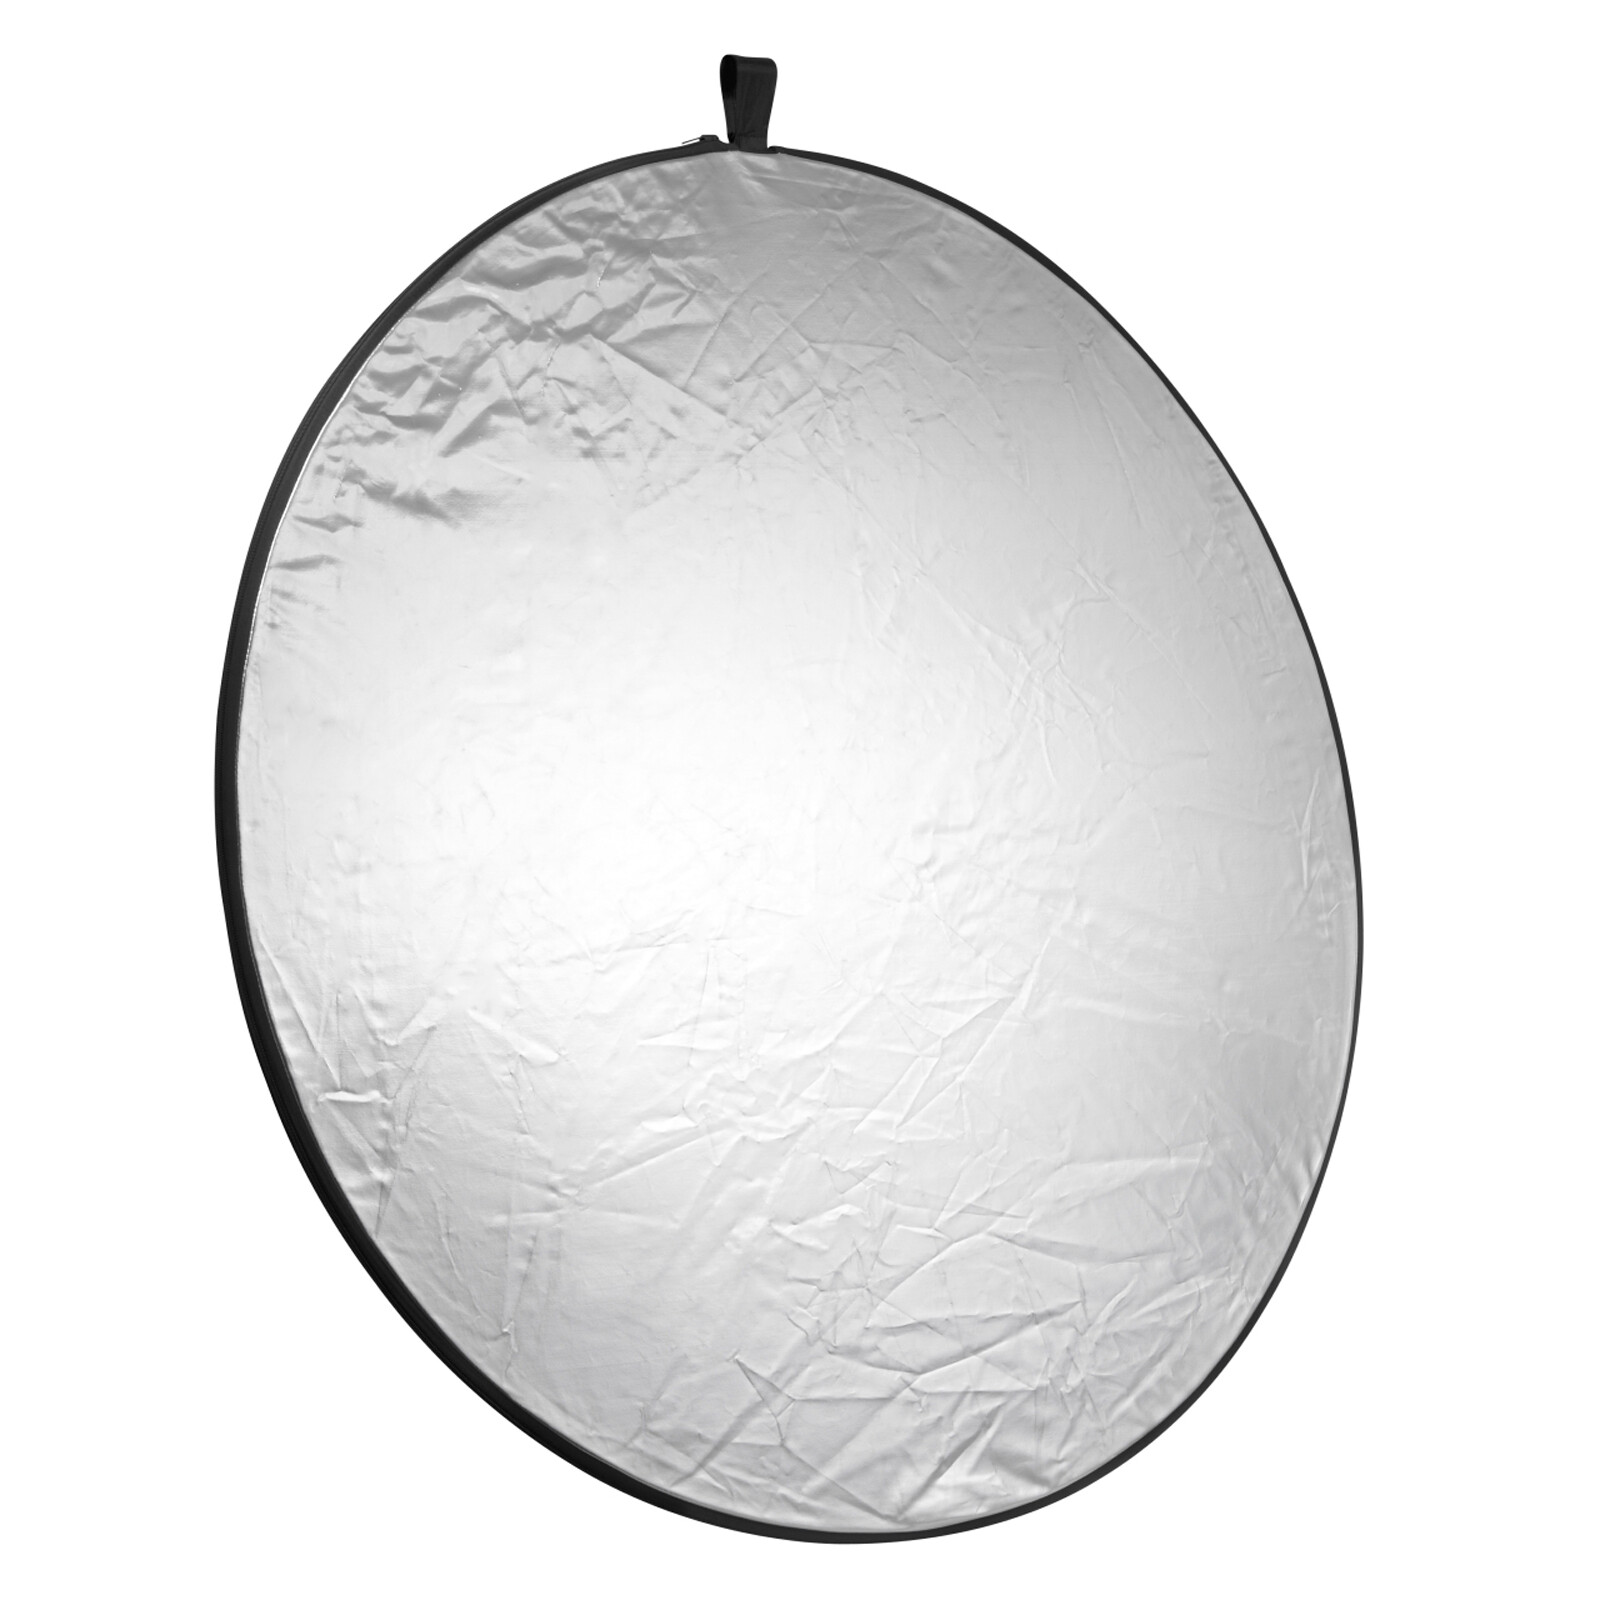 walimex 5in1 Reflektoren Set, 150cm